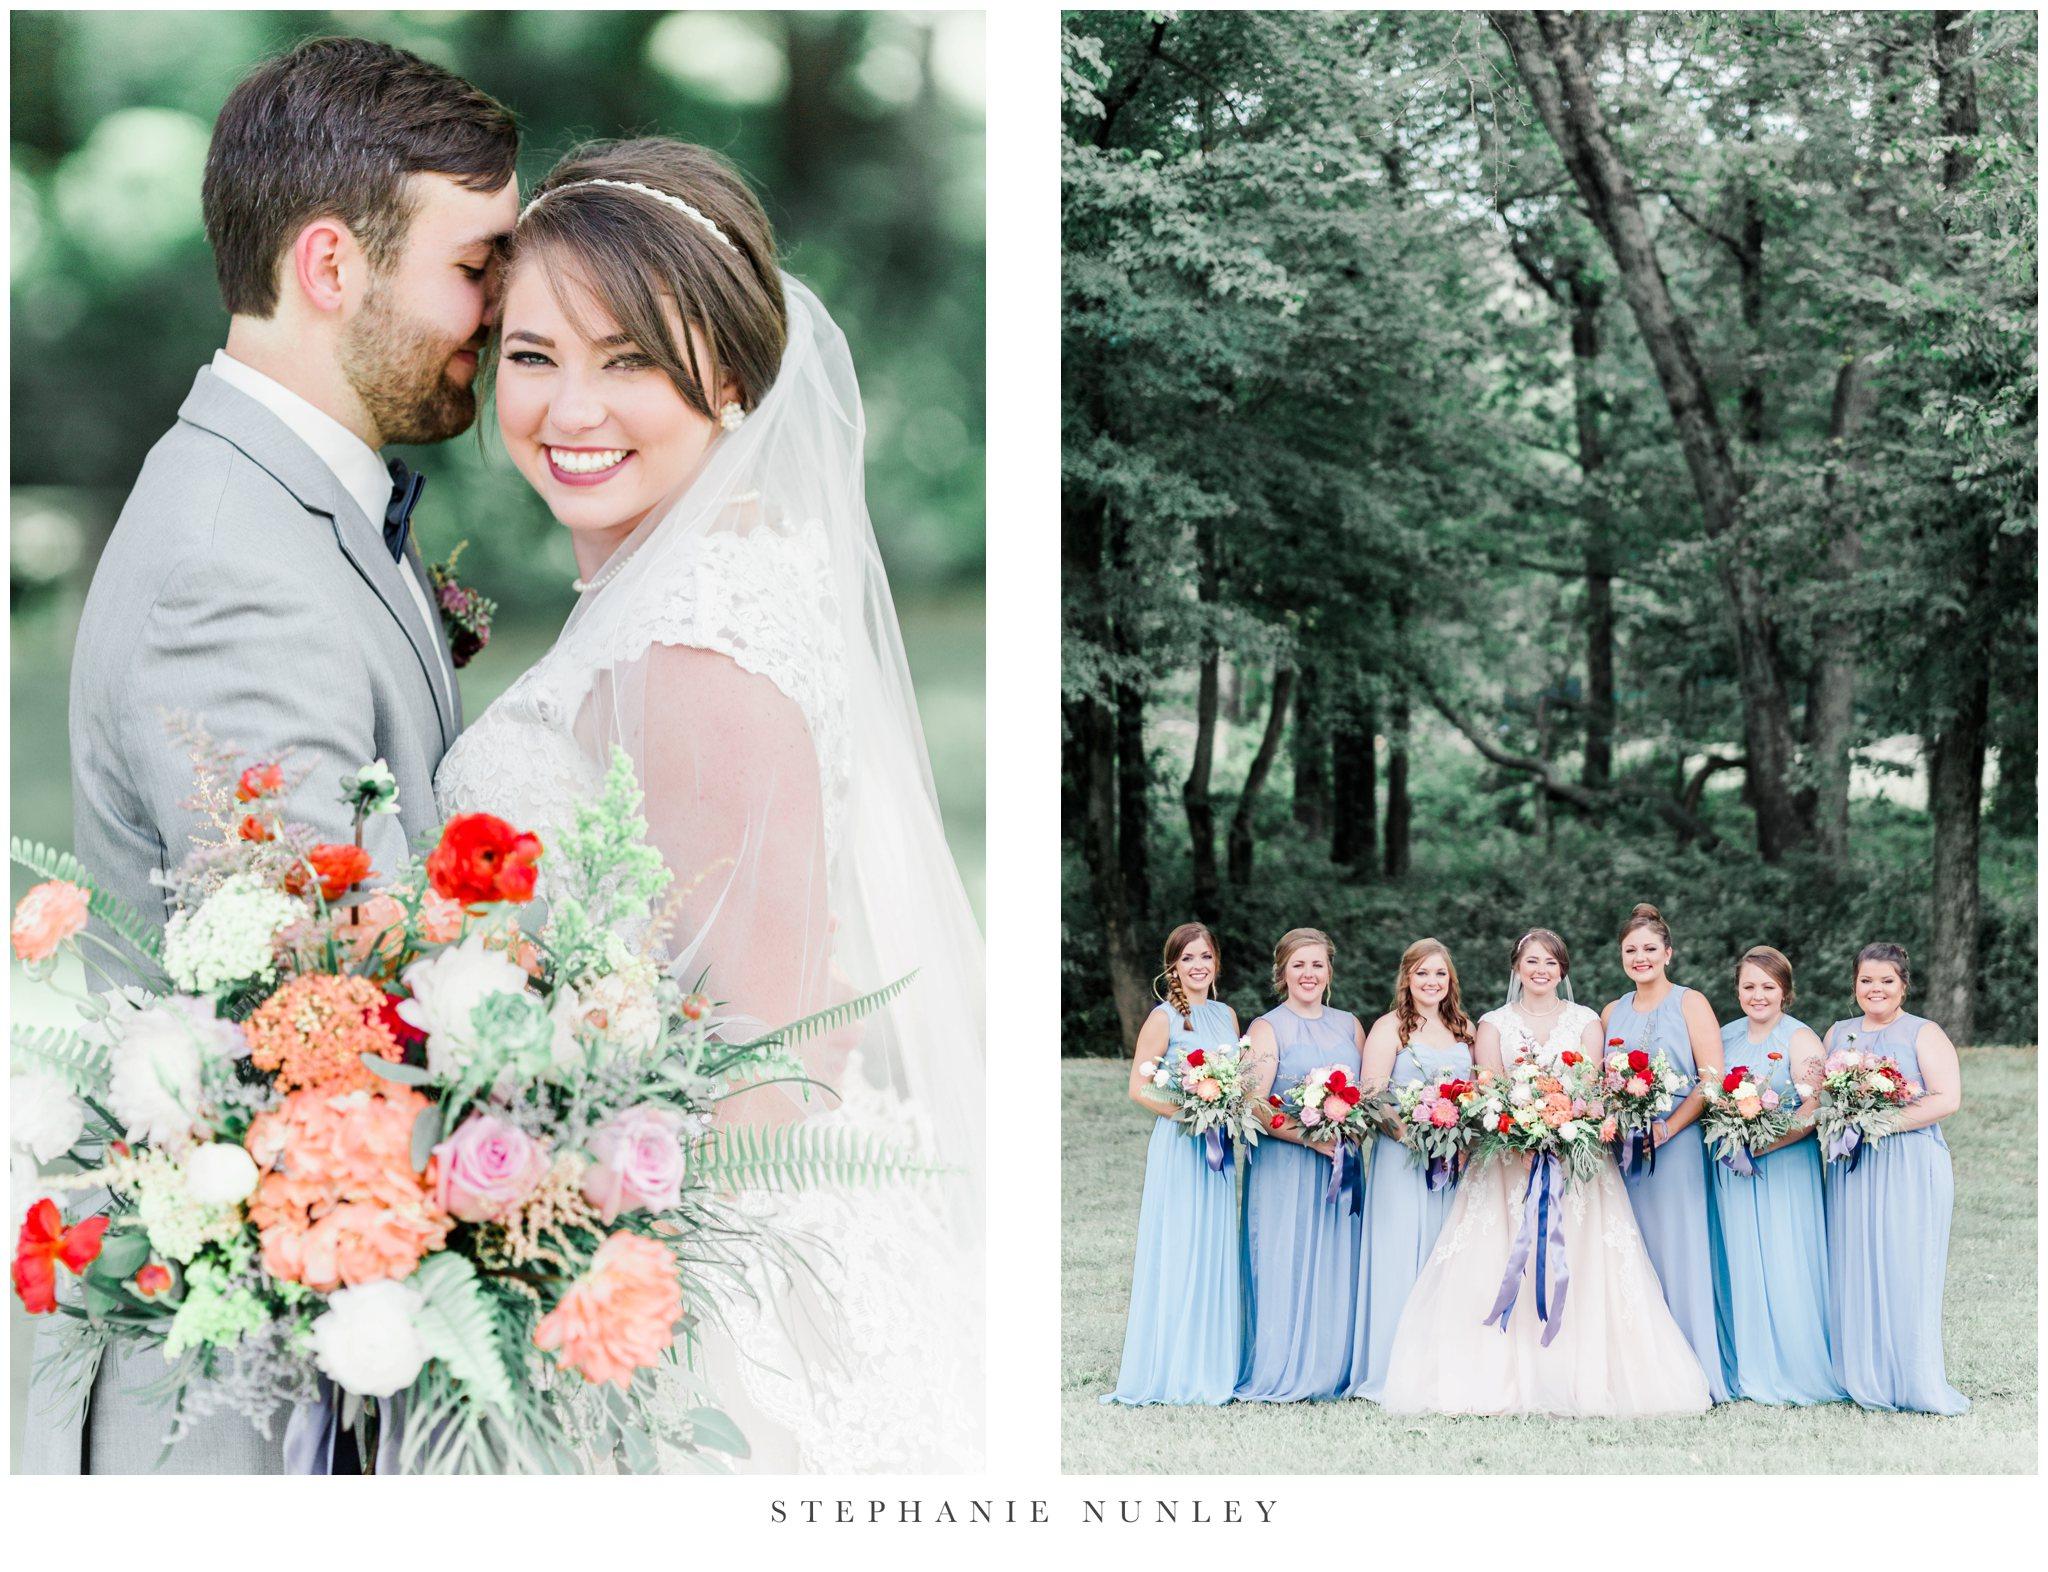 arkansas-wedding-with-lush-wildflower-bouquet-0055.jpg